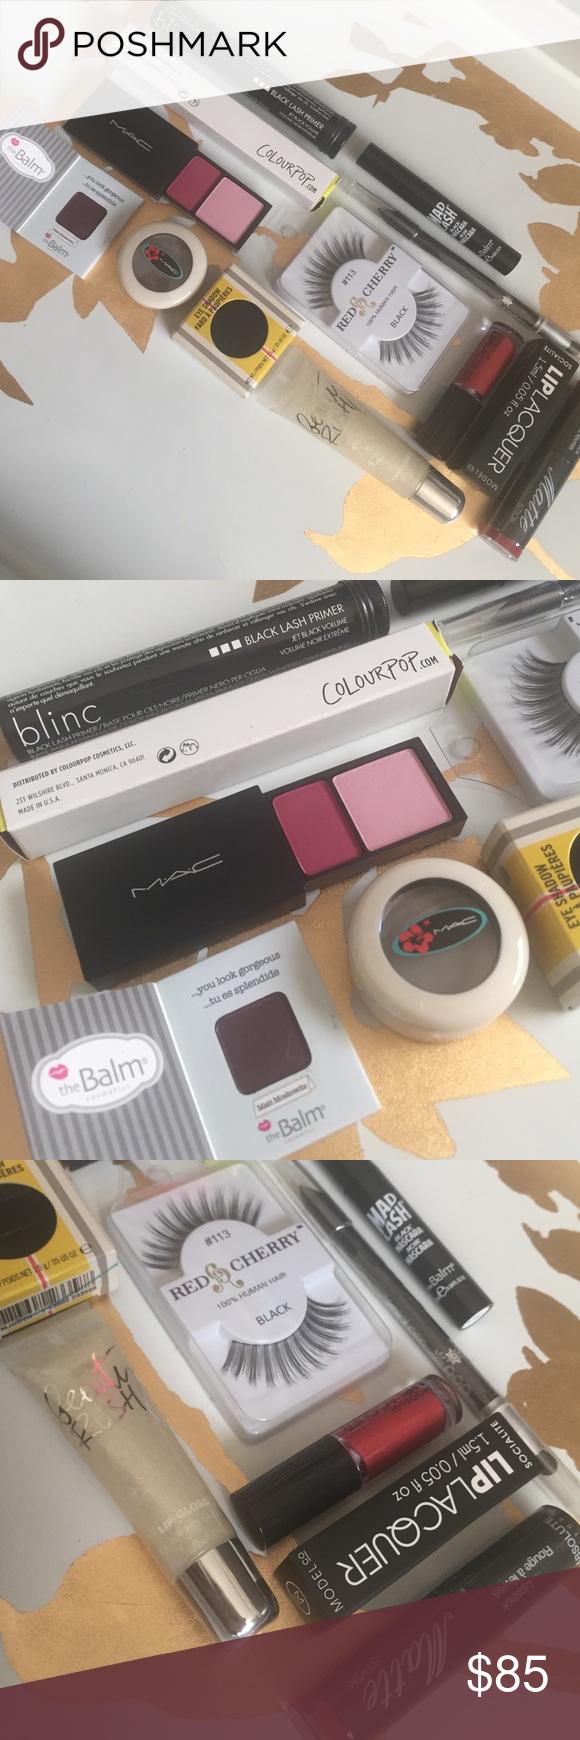 MAC Blinc Mascara Primer, Pop Beauty Makeup Set Amazing